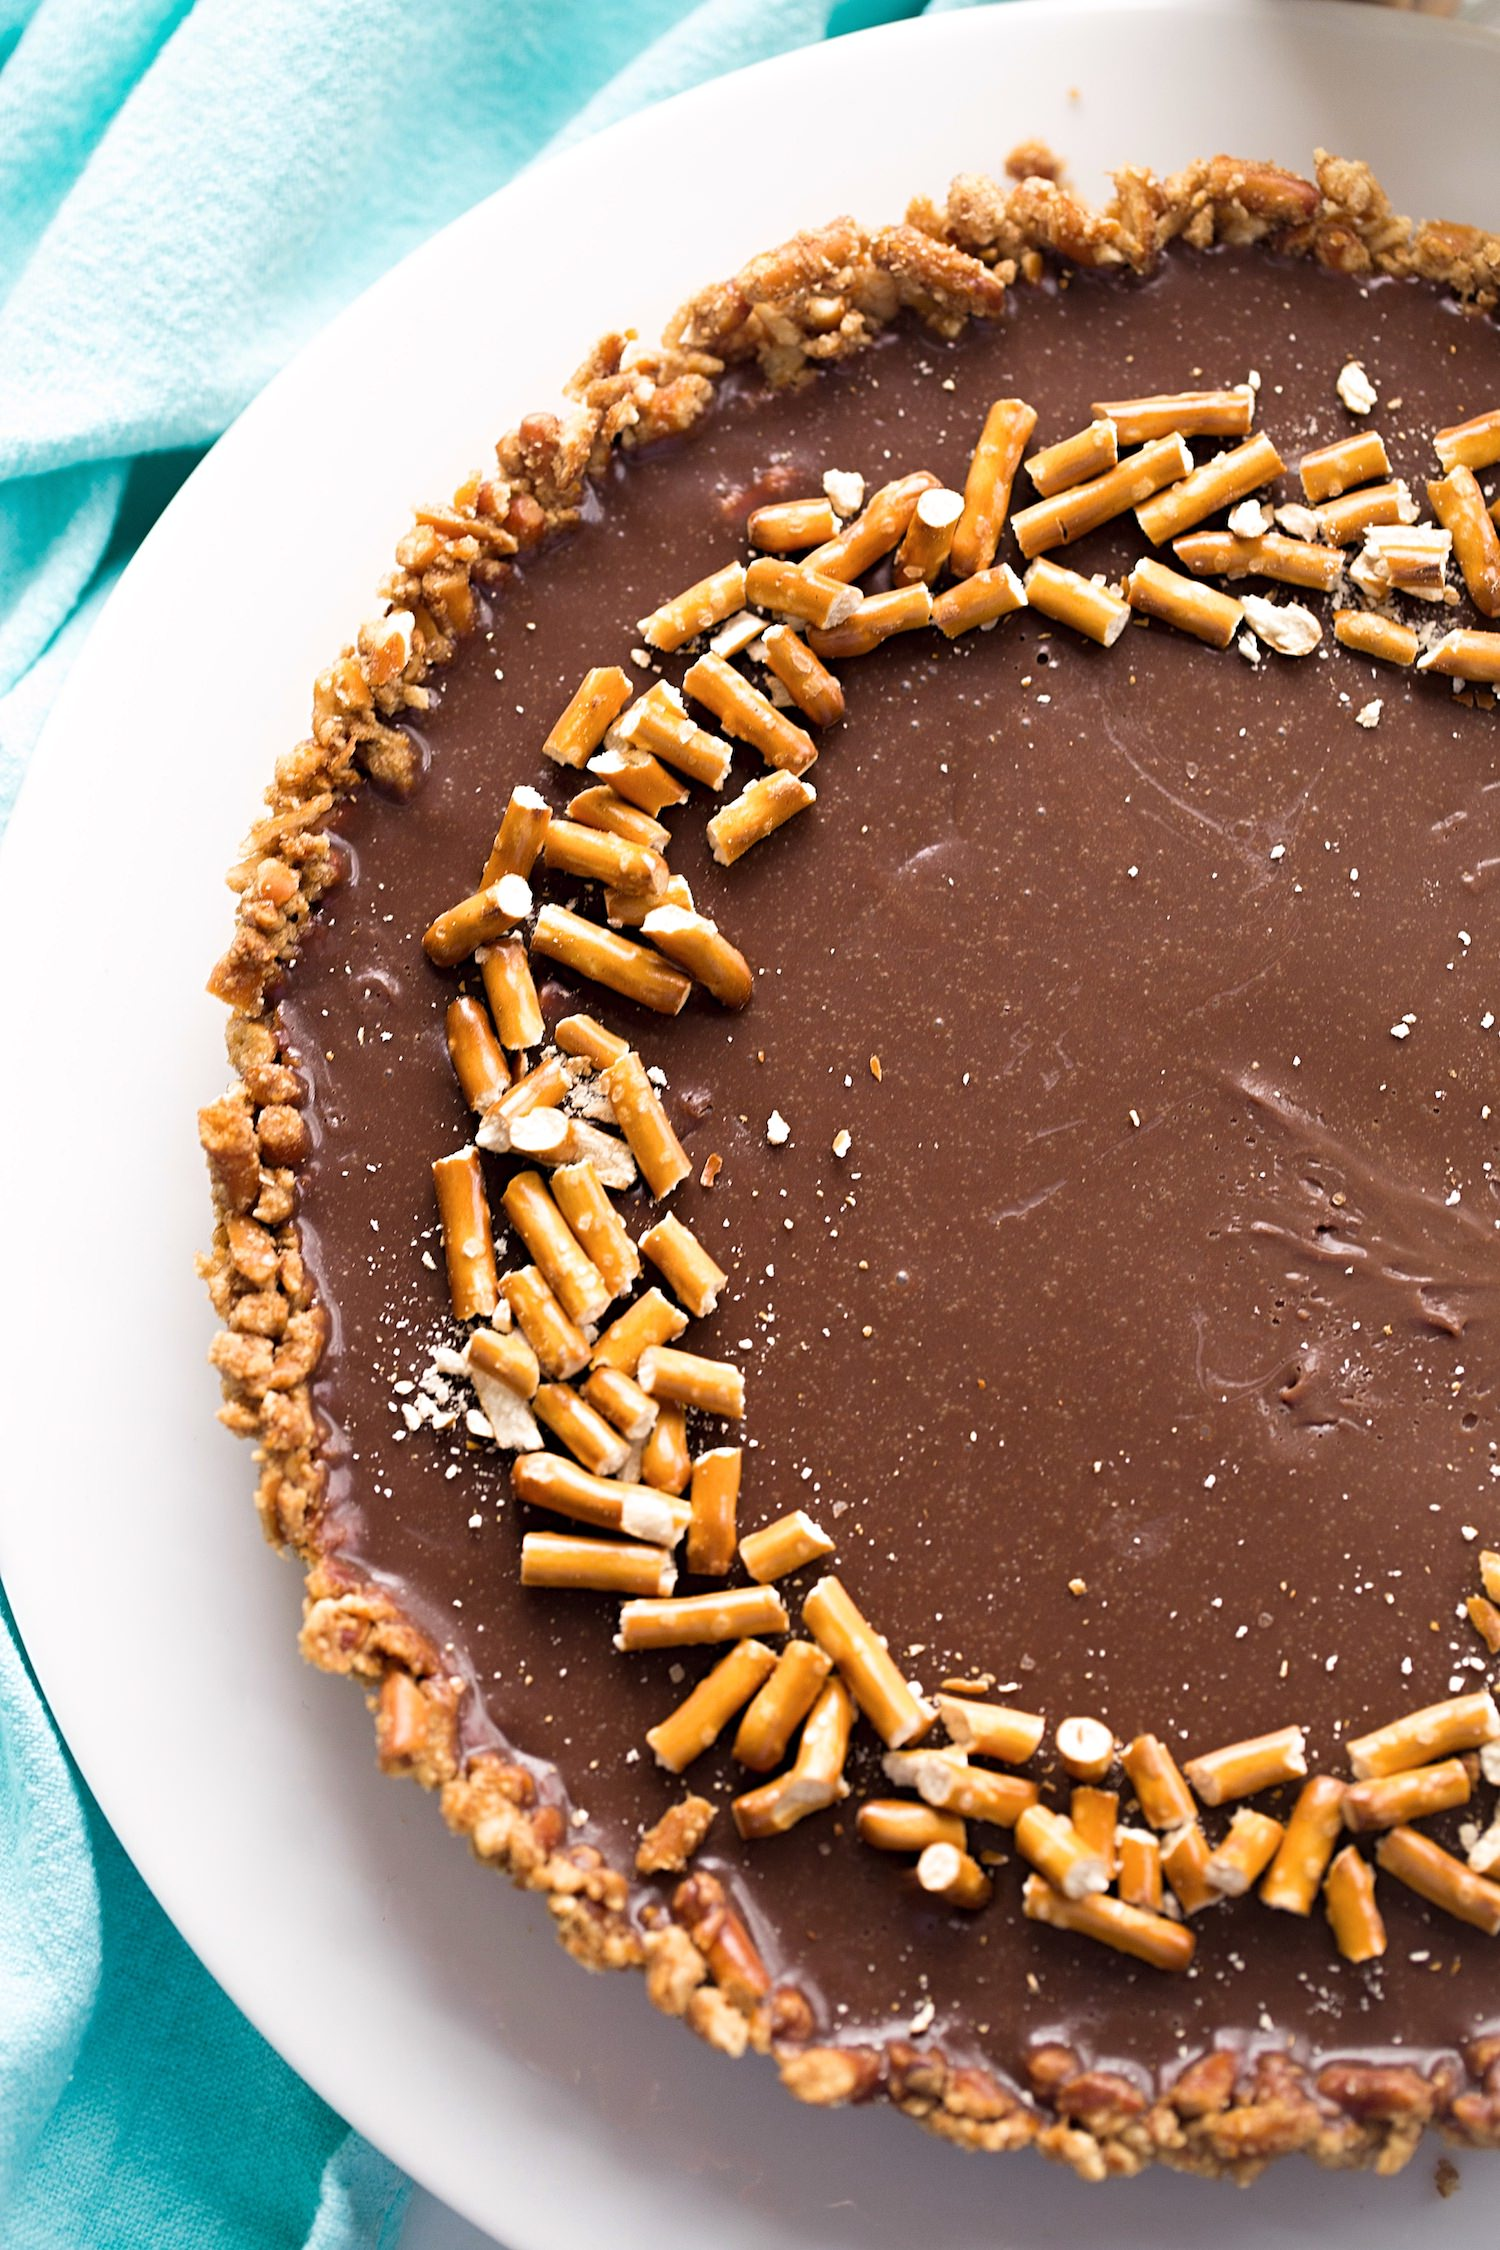 Pretzel Crust Milk Chocolate Tart: a crunchy, salty and sweet pretzel crust filled with a rich, creamy, milk chocolate ganache. Too good! | TrufflesandTrends.com